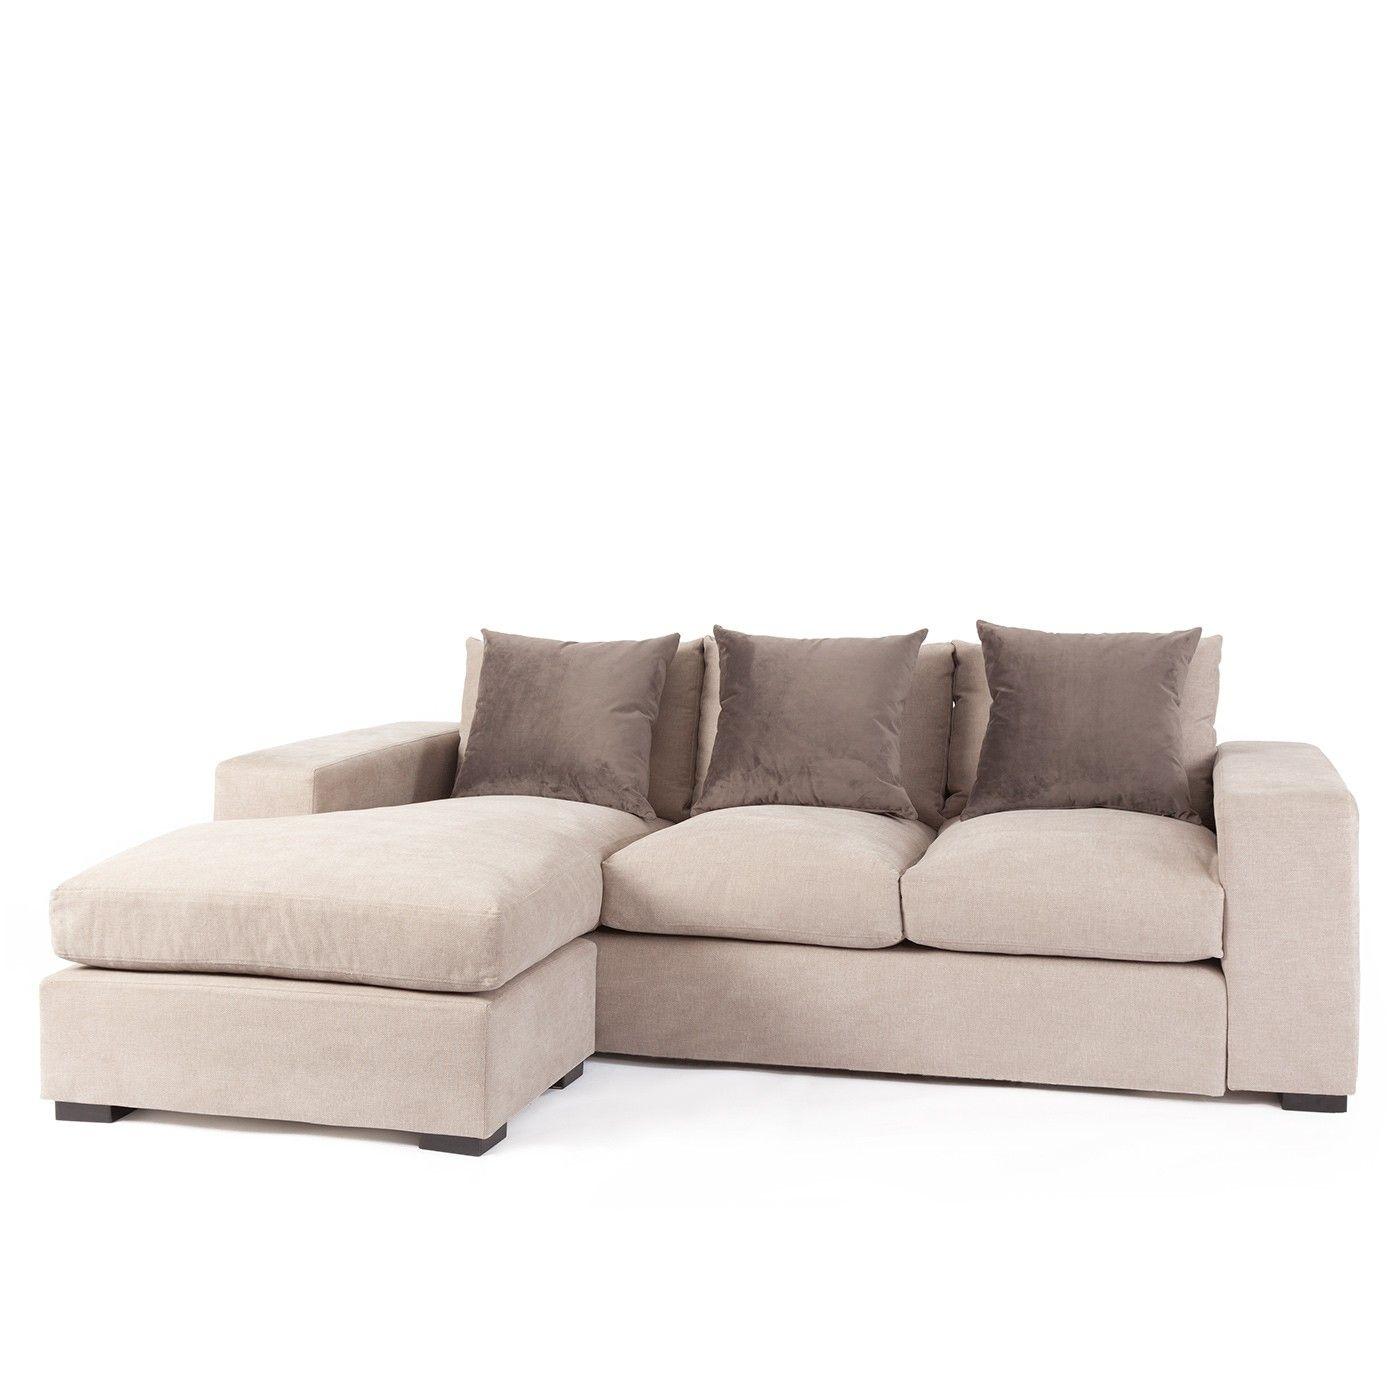 Manhattan Sofa Bed Sofa Beds Raft Furniture London Bed Linens Luxury Sofa Sofa Bed